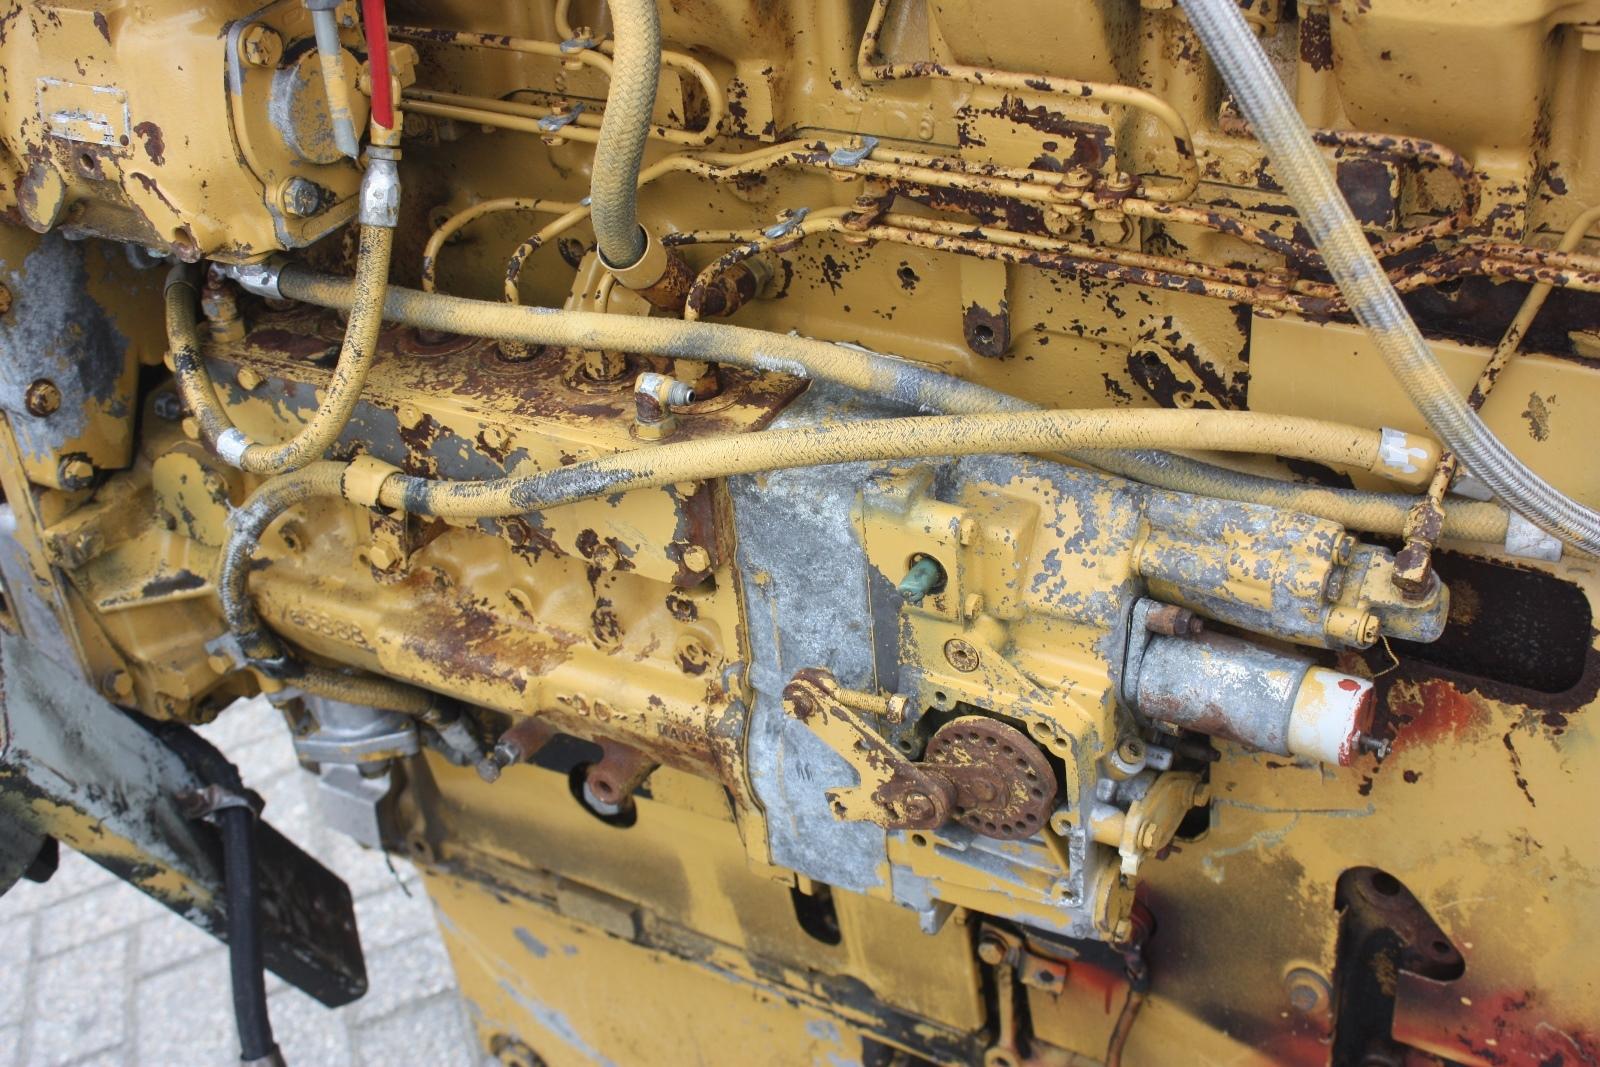 Caterpillar 3406b 0 Engine